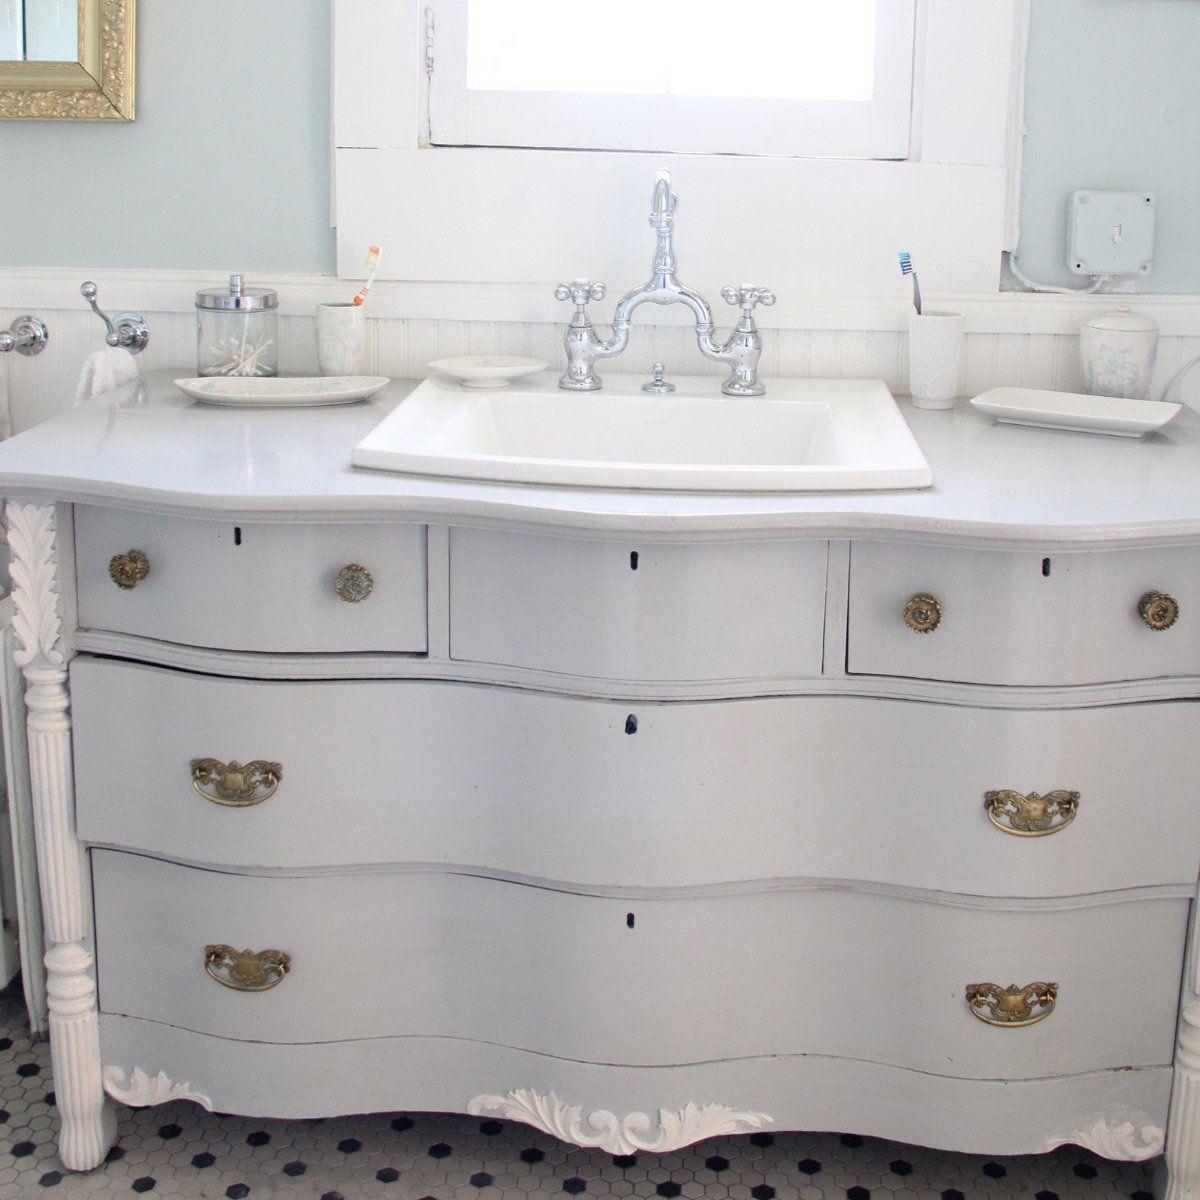 12 Astonishing Diy Bathroom Vanity Makeovers Diy Bathroom Vanity Distressed Bathroom Vanity Dresser Vanity Bathroom [ 1200 x 1200 Pixel ]